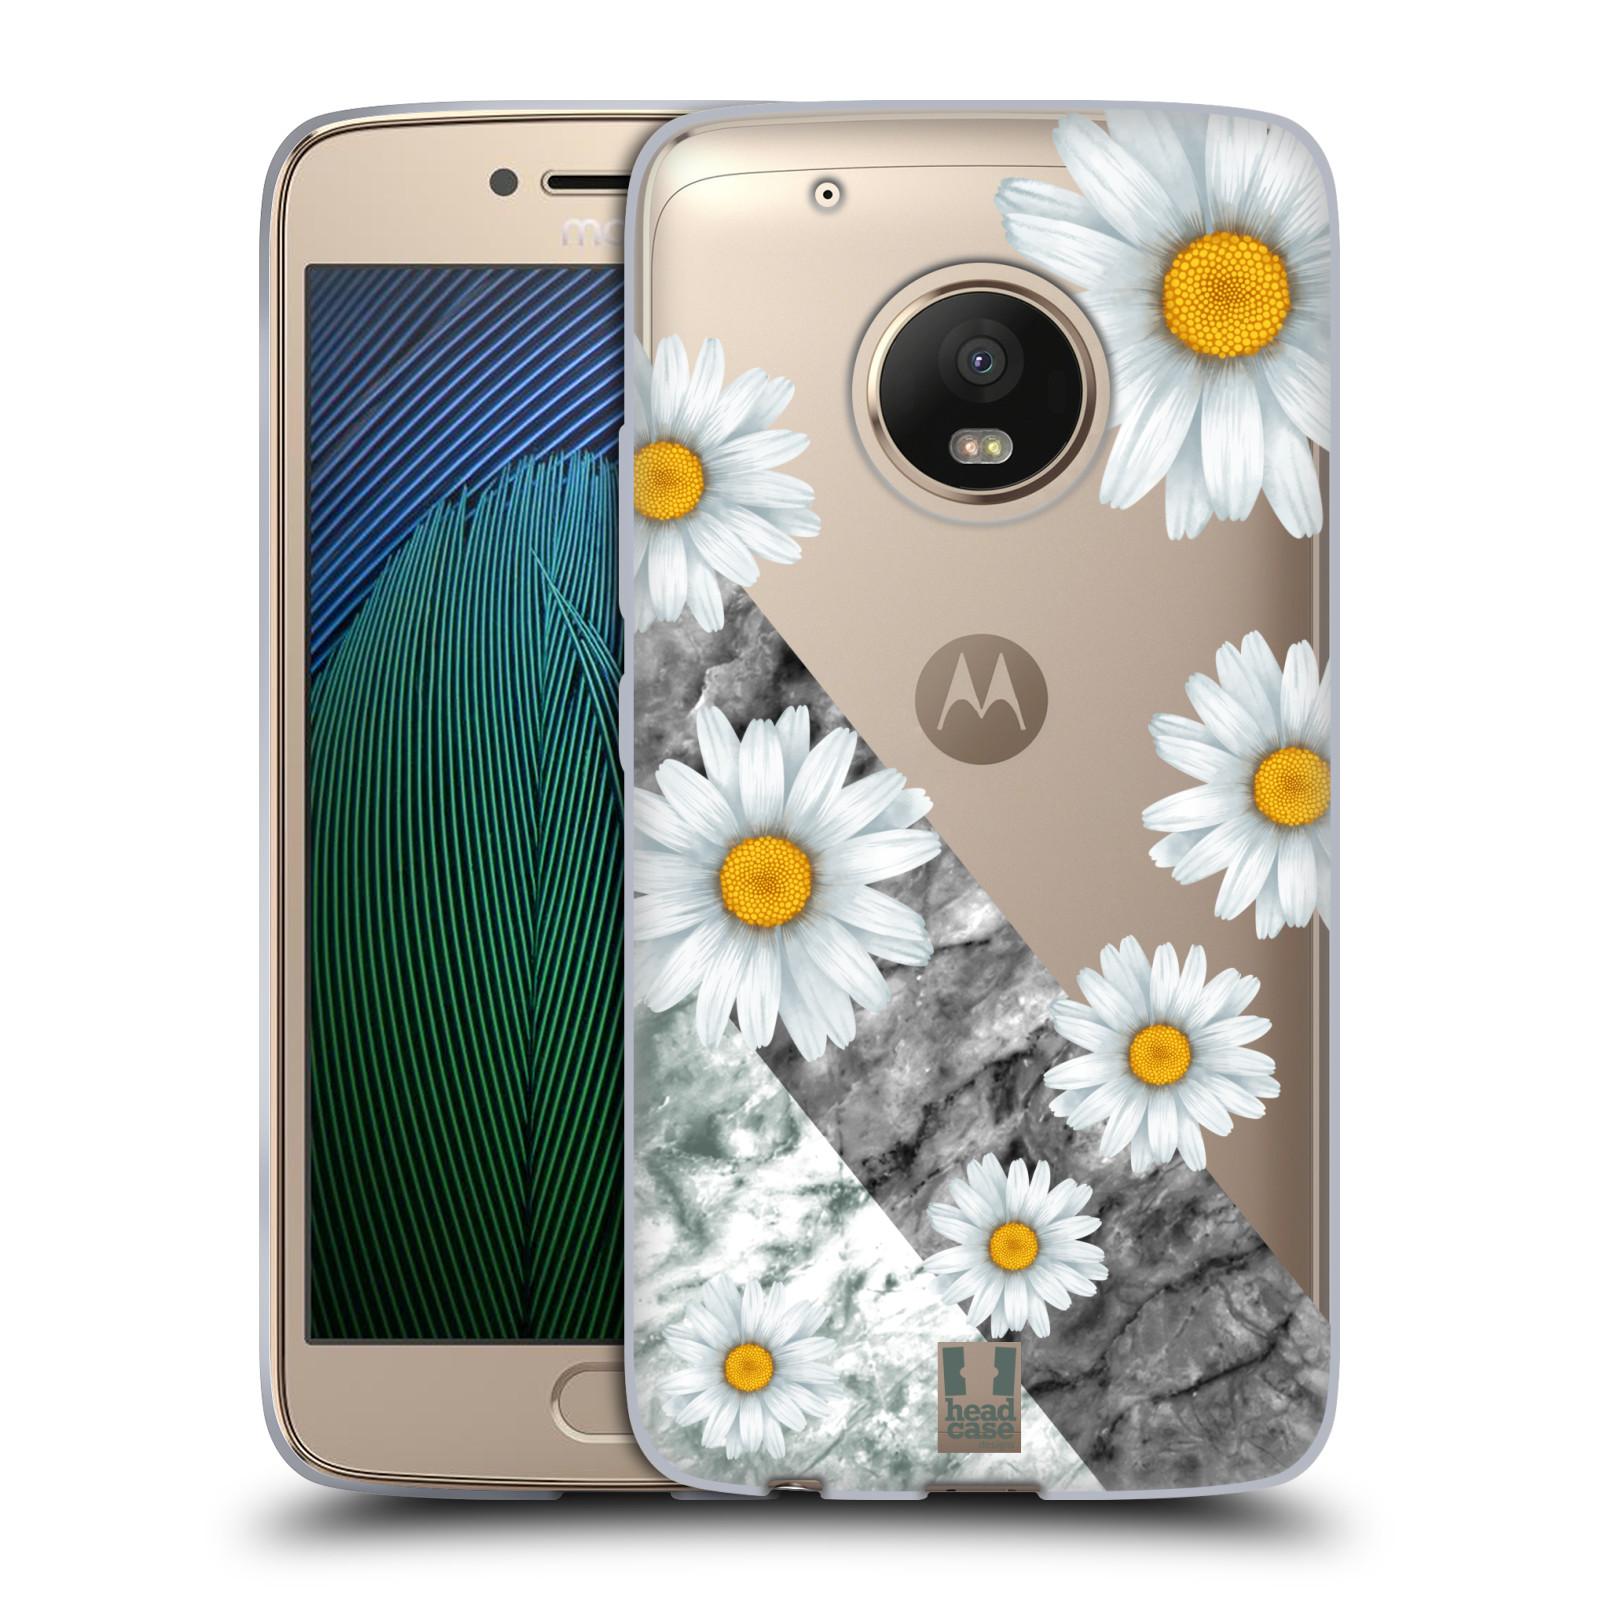 HEAD CASE silikonový obal na mobil Lenovo Moto G5 PLUS květina sedmikráska  a mramor 2883cf687b3